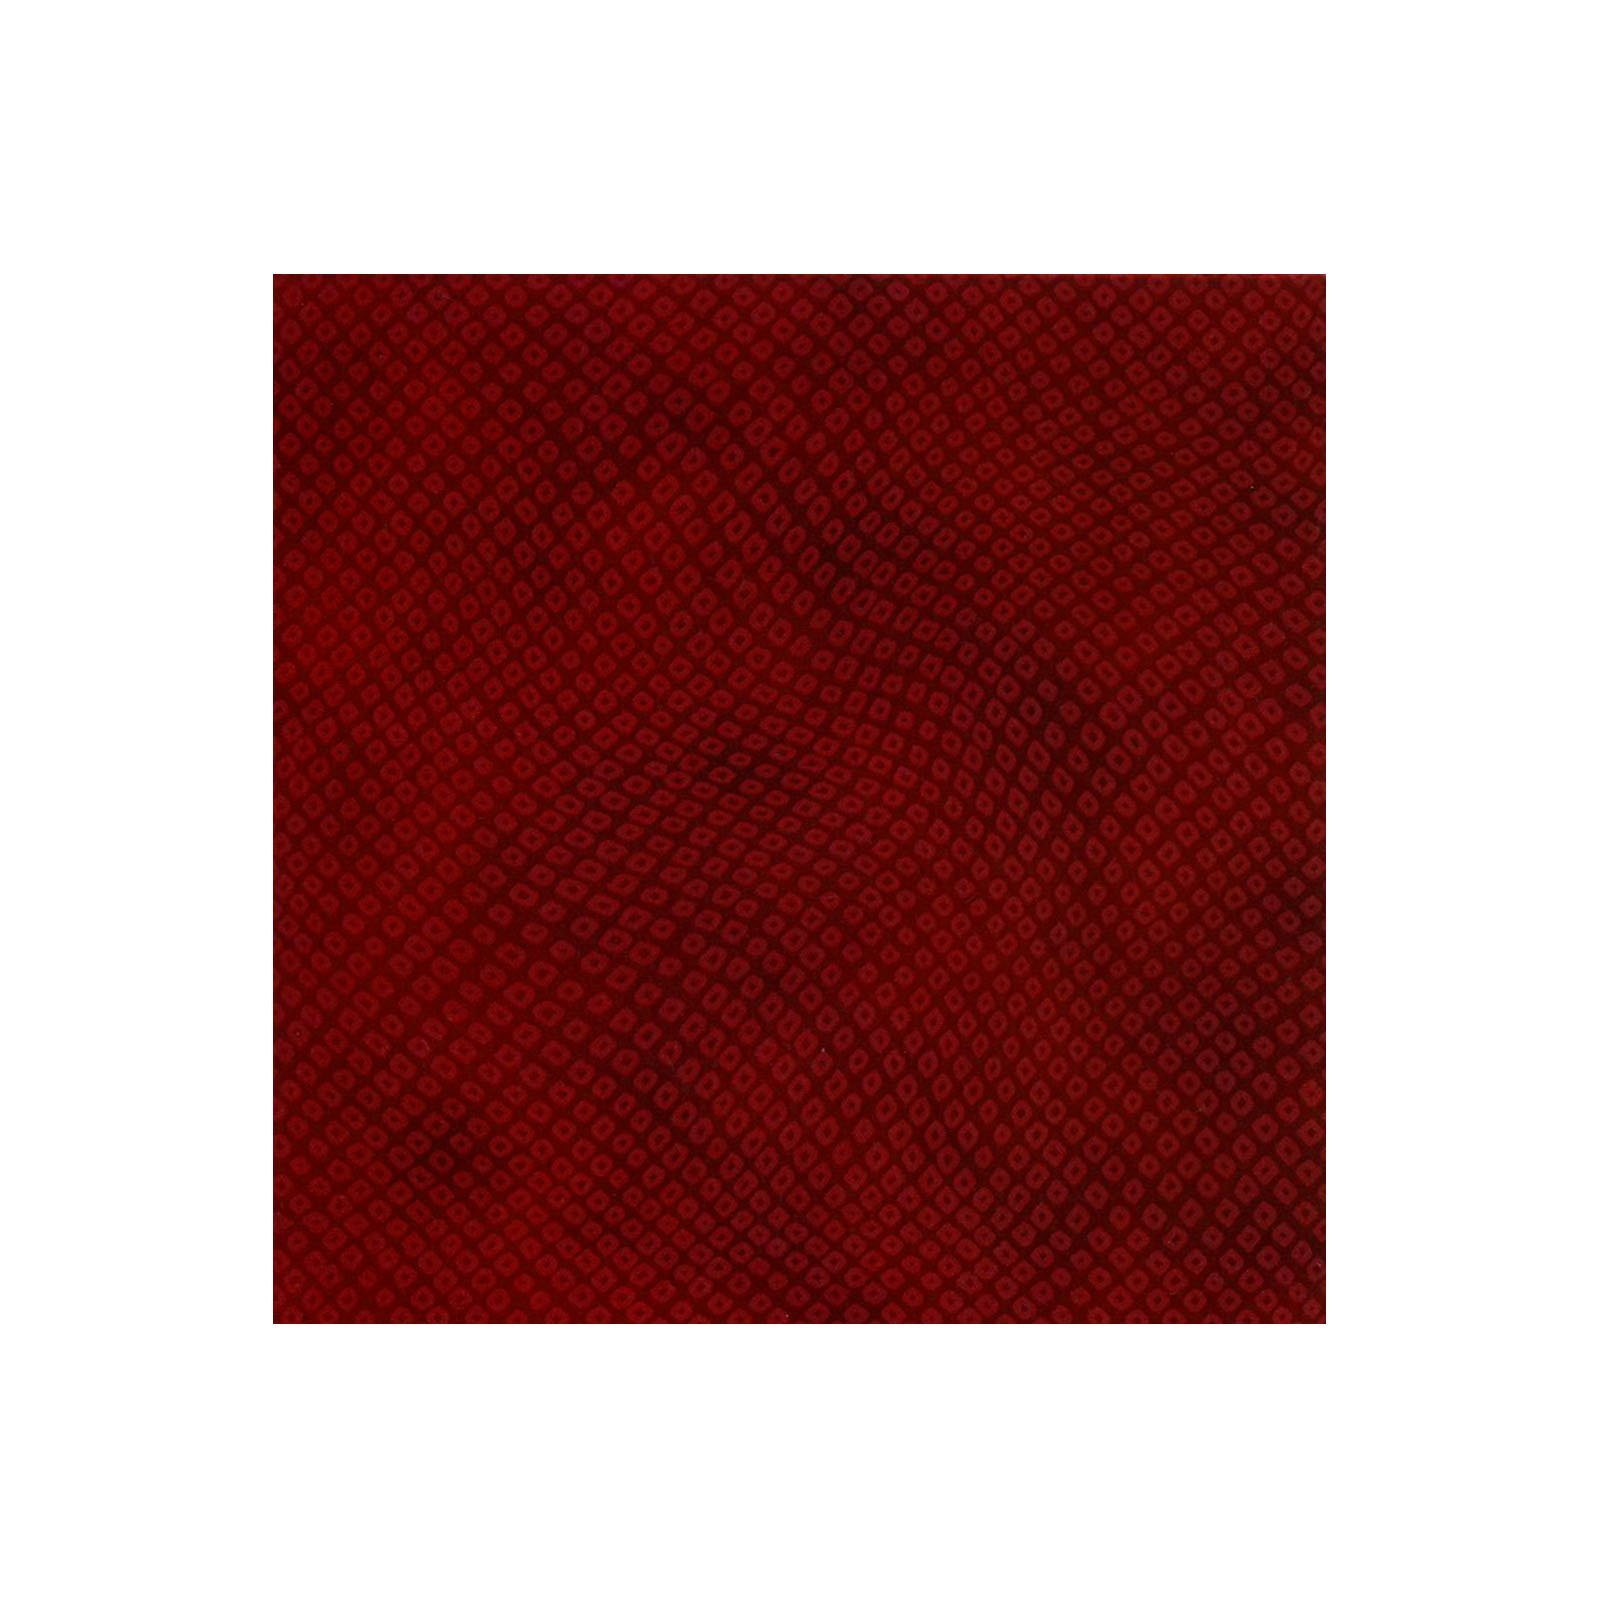 Shibori Tonal - Red